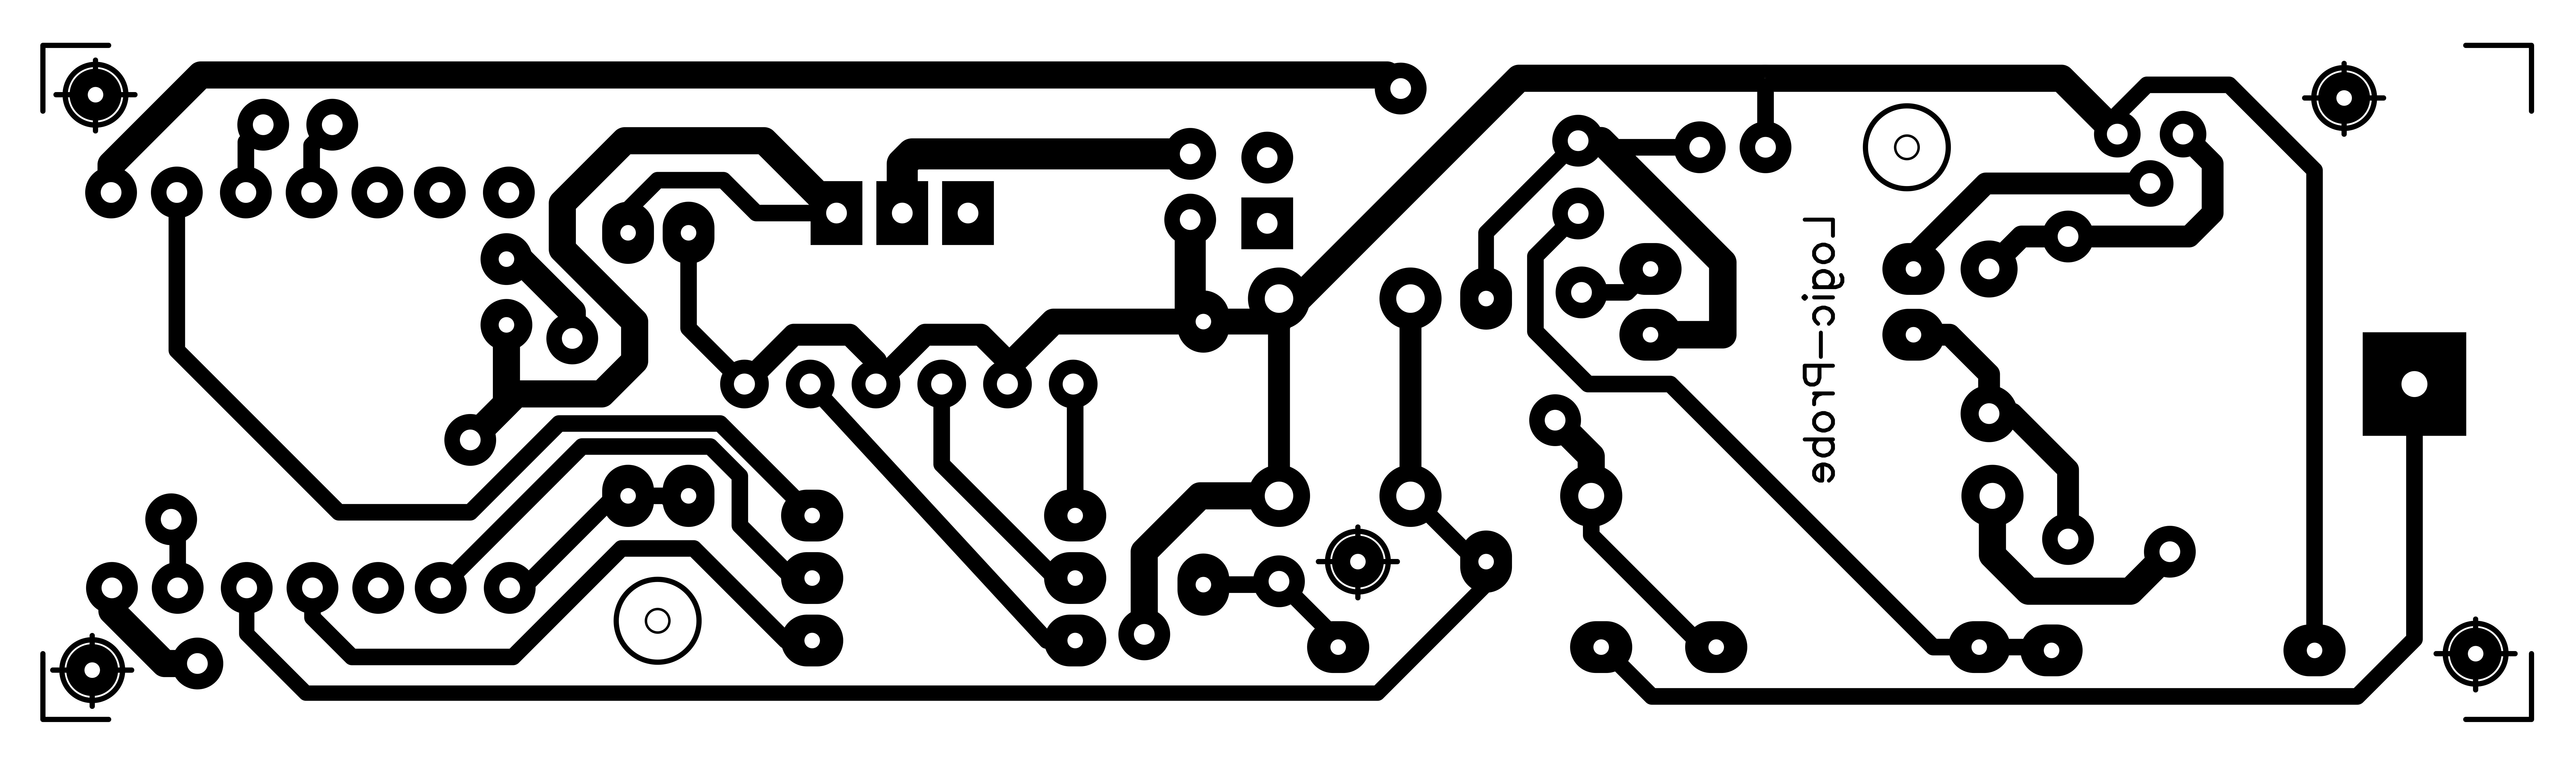 Pcb logic probe 2021 03 24 bottom wnrflxhn0r